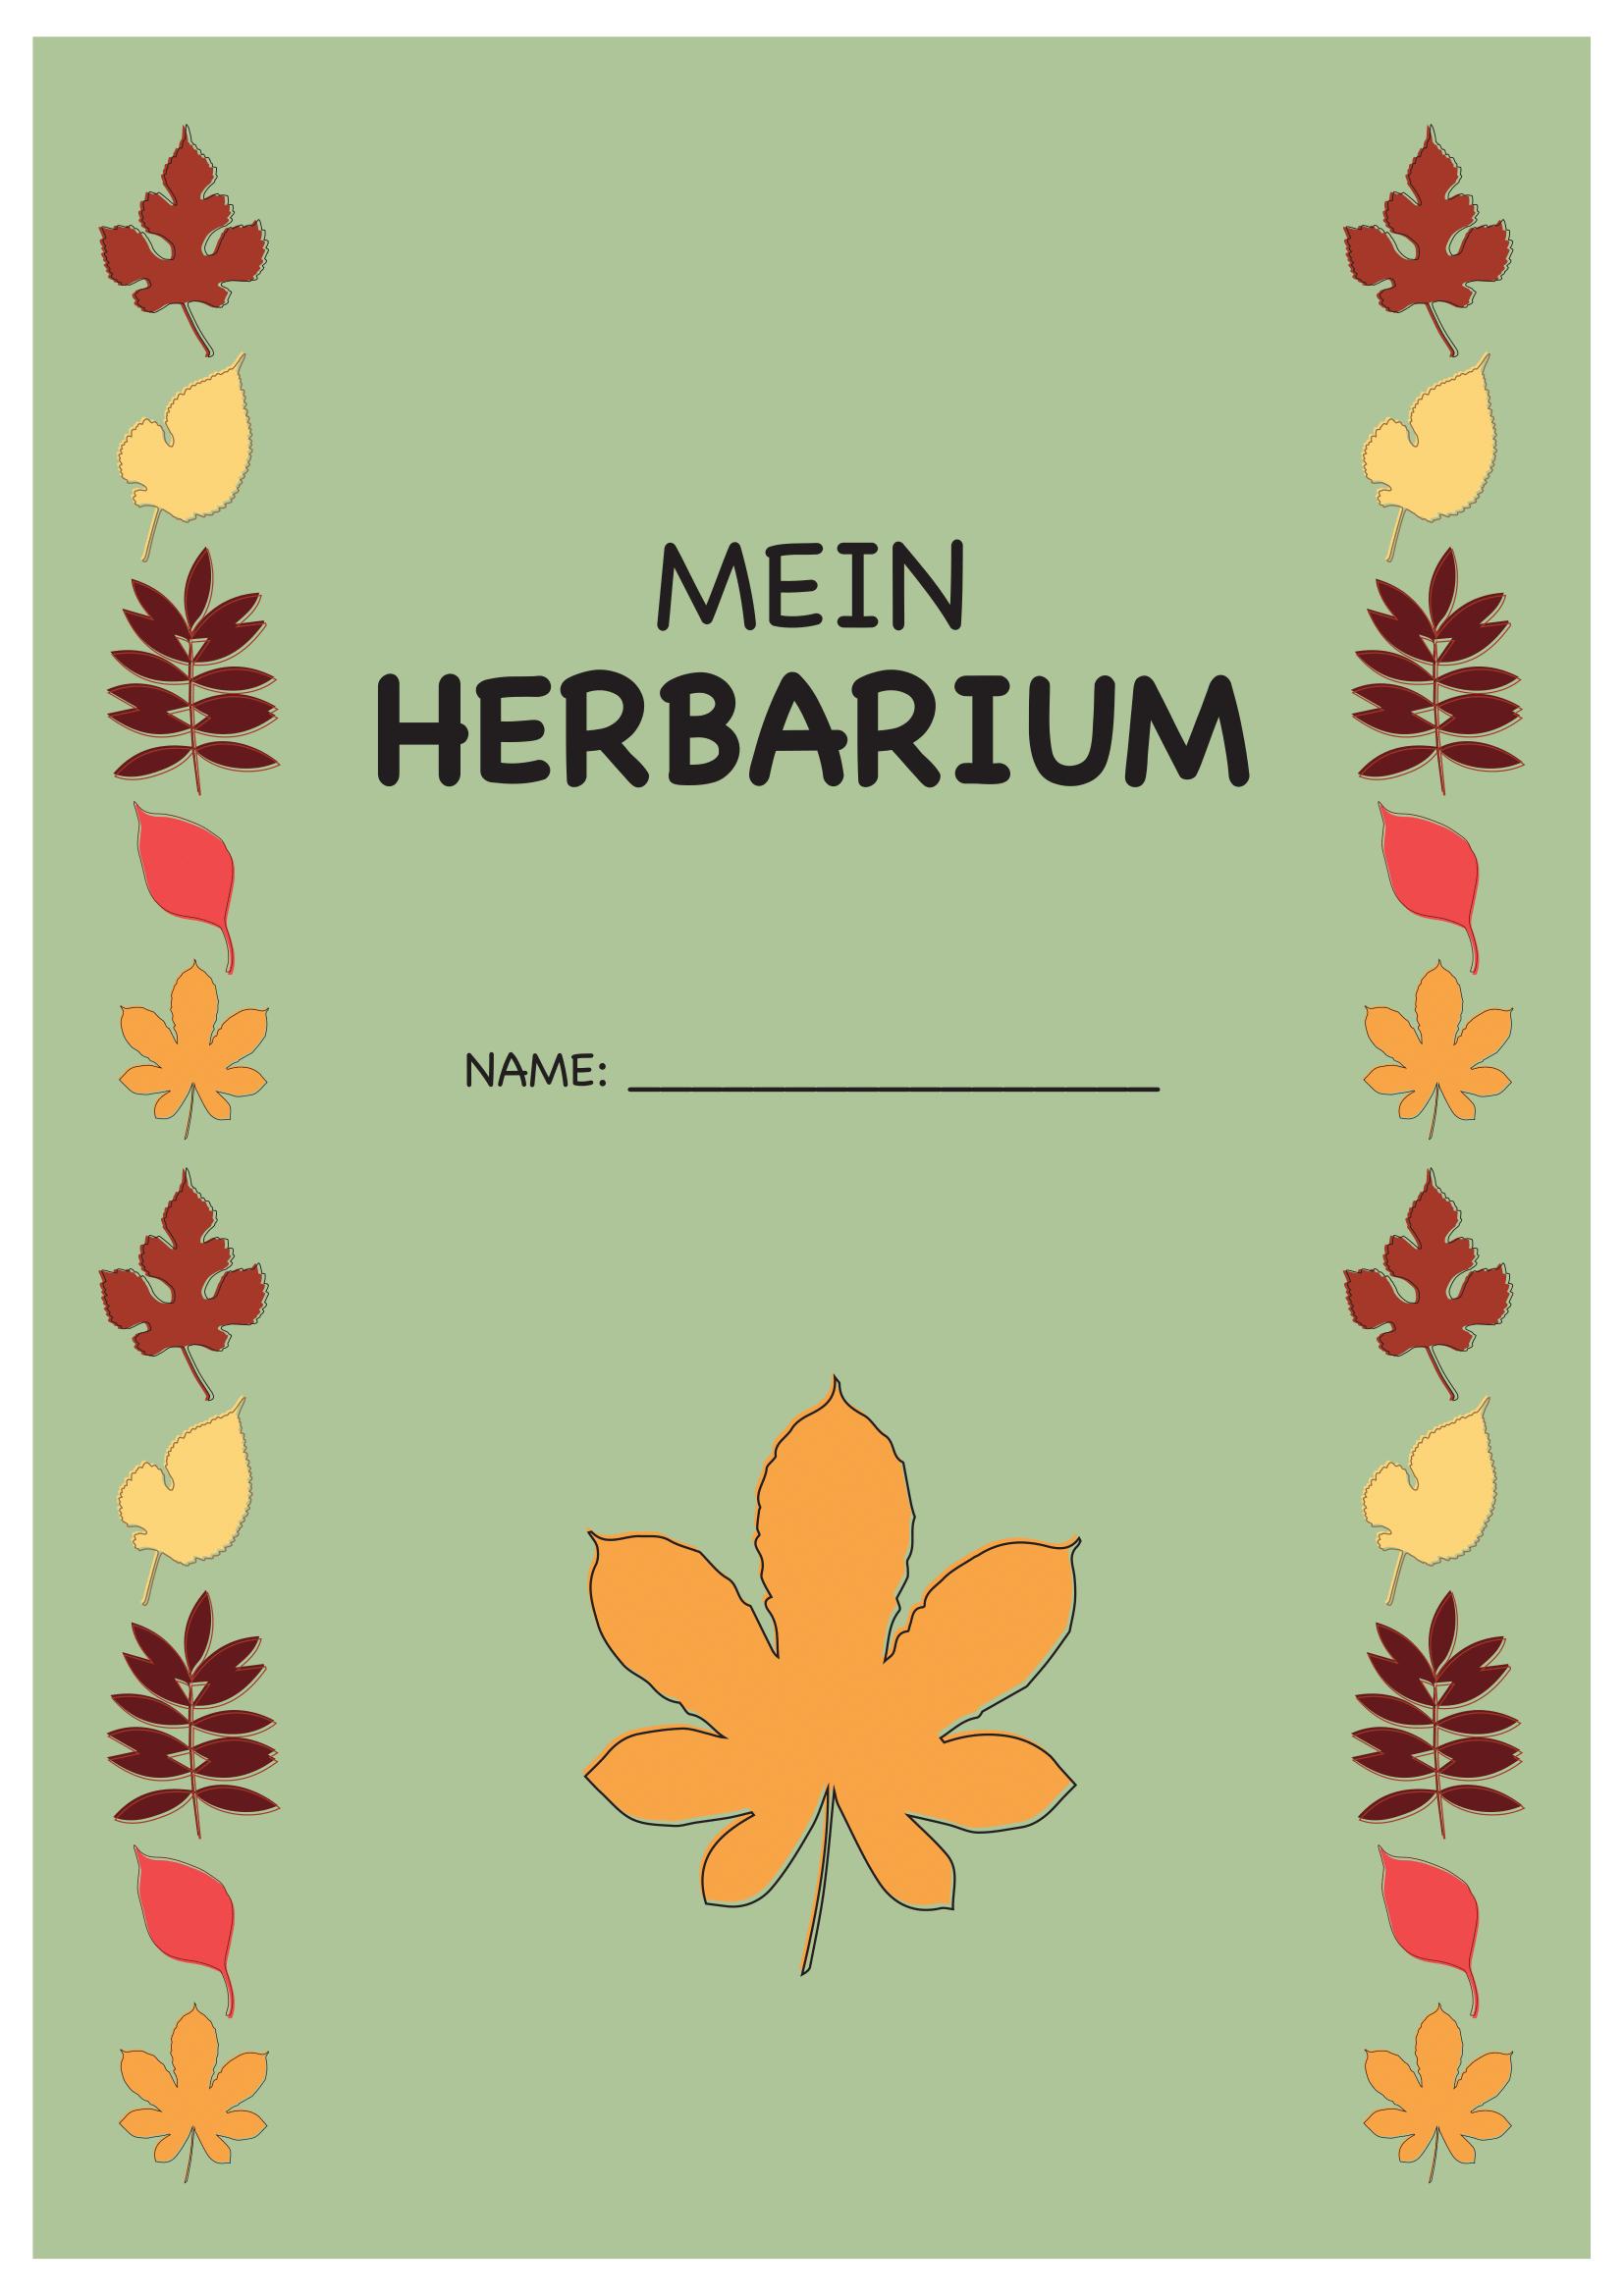 Deckblatt Herbarium 3 Deckblatt Vorlage Deckblatt Schule Deckblatt